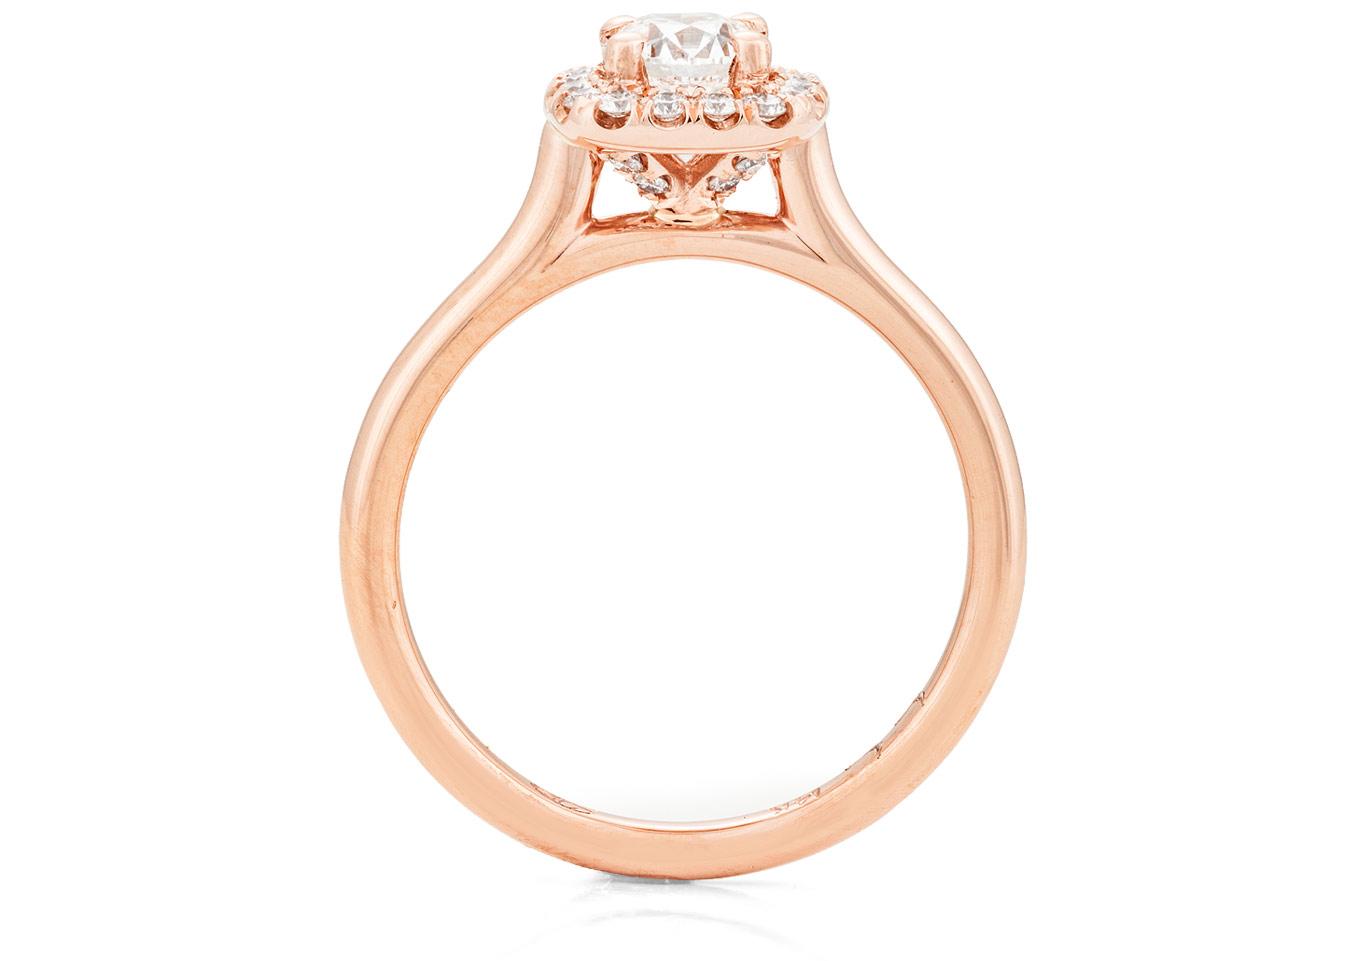 bella italia bridal ring